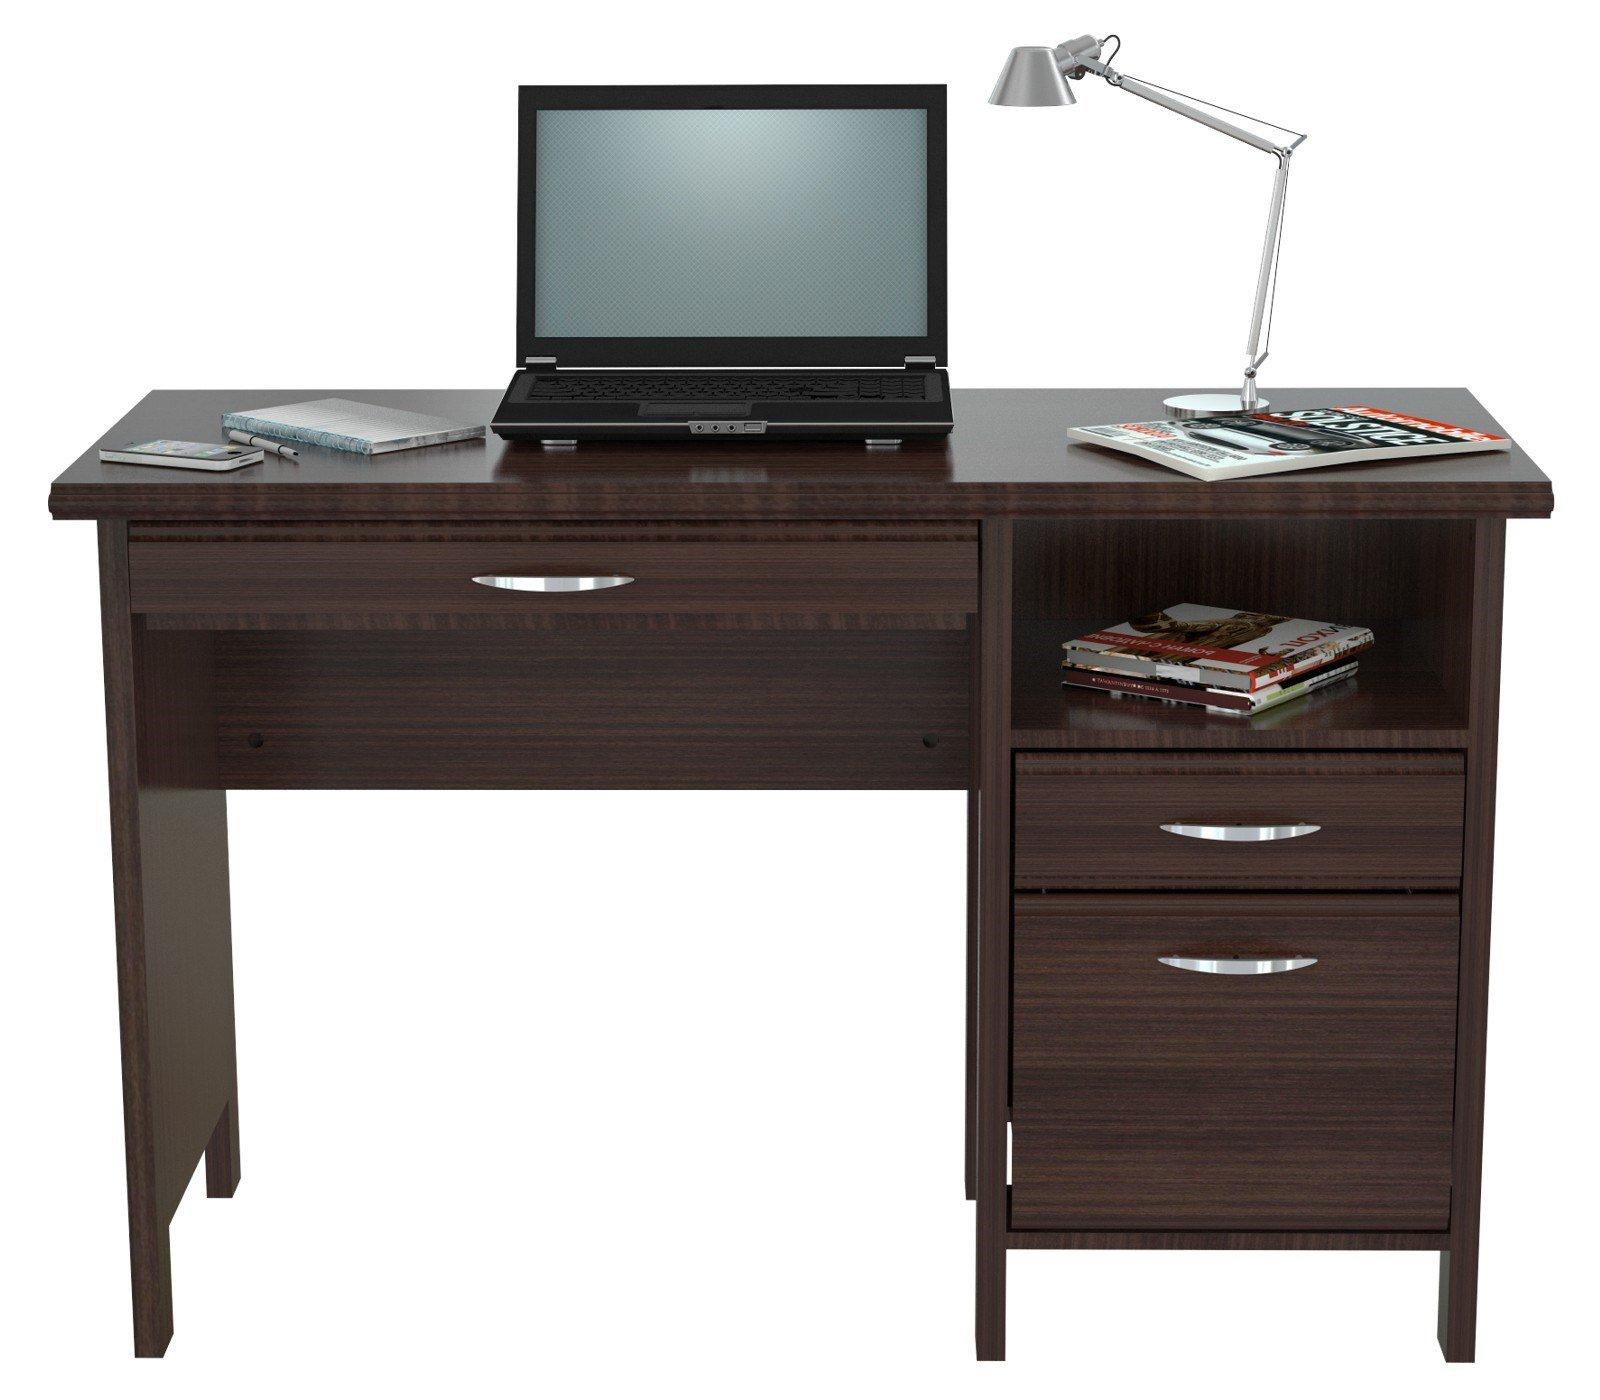 Inval America ES-2403 Softform Desk